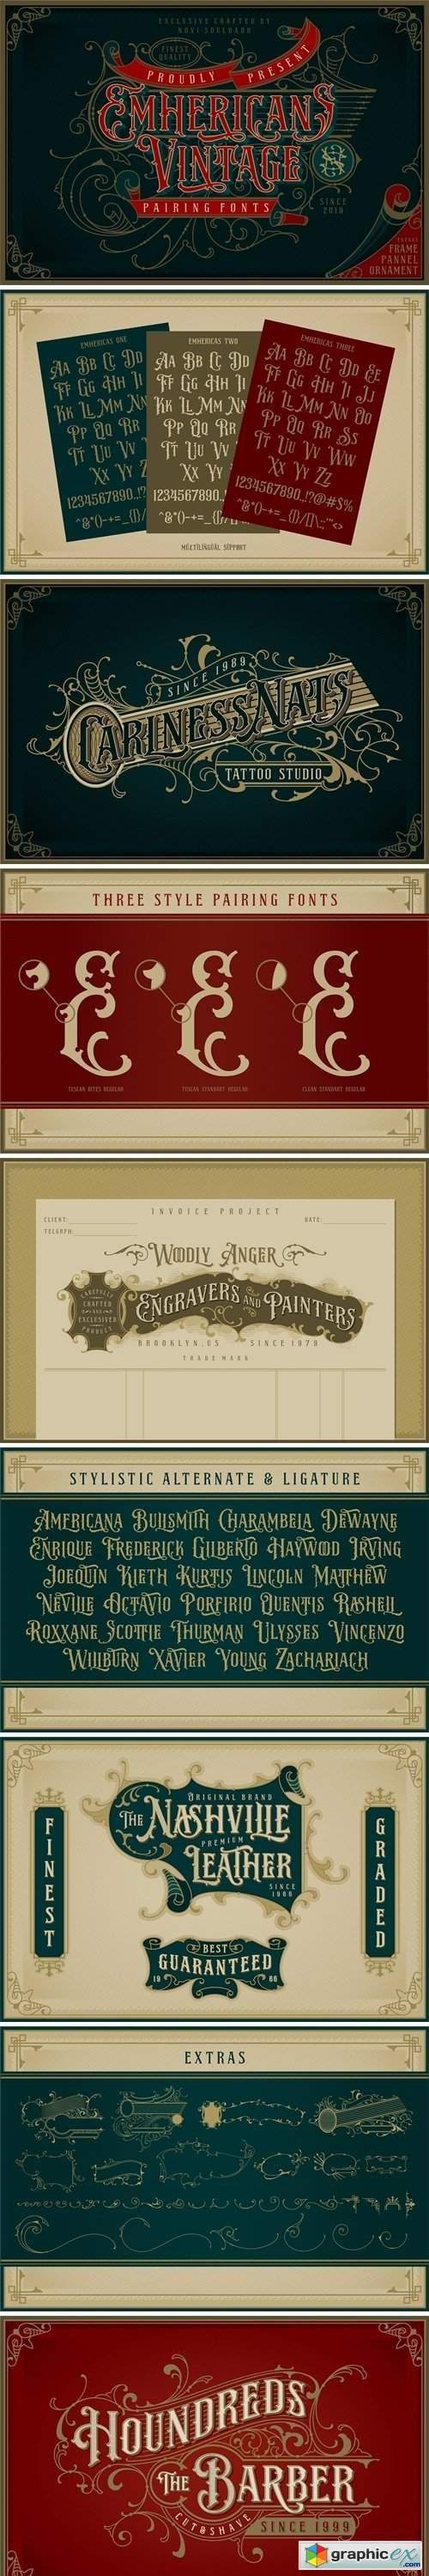 NS Emnhericans Vintage Pairing Fonts